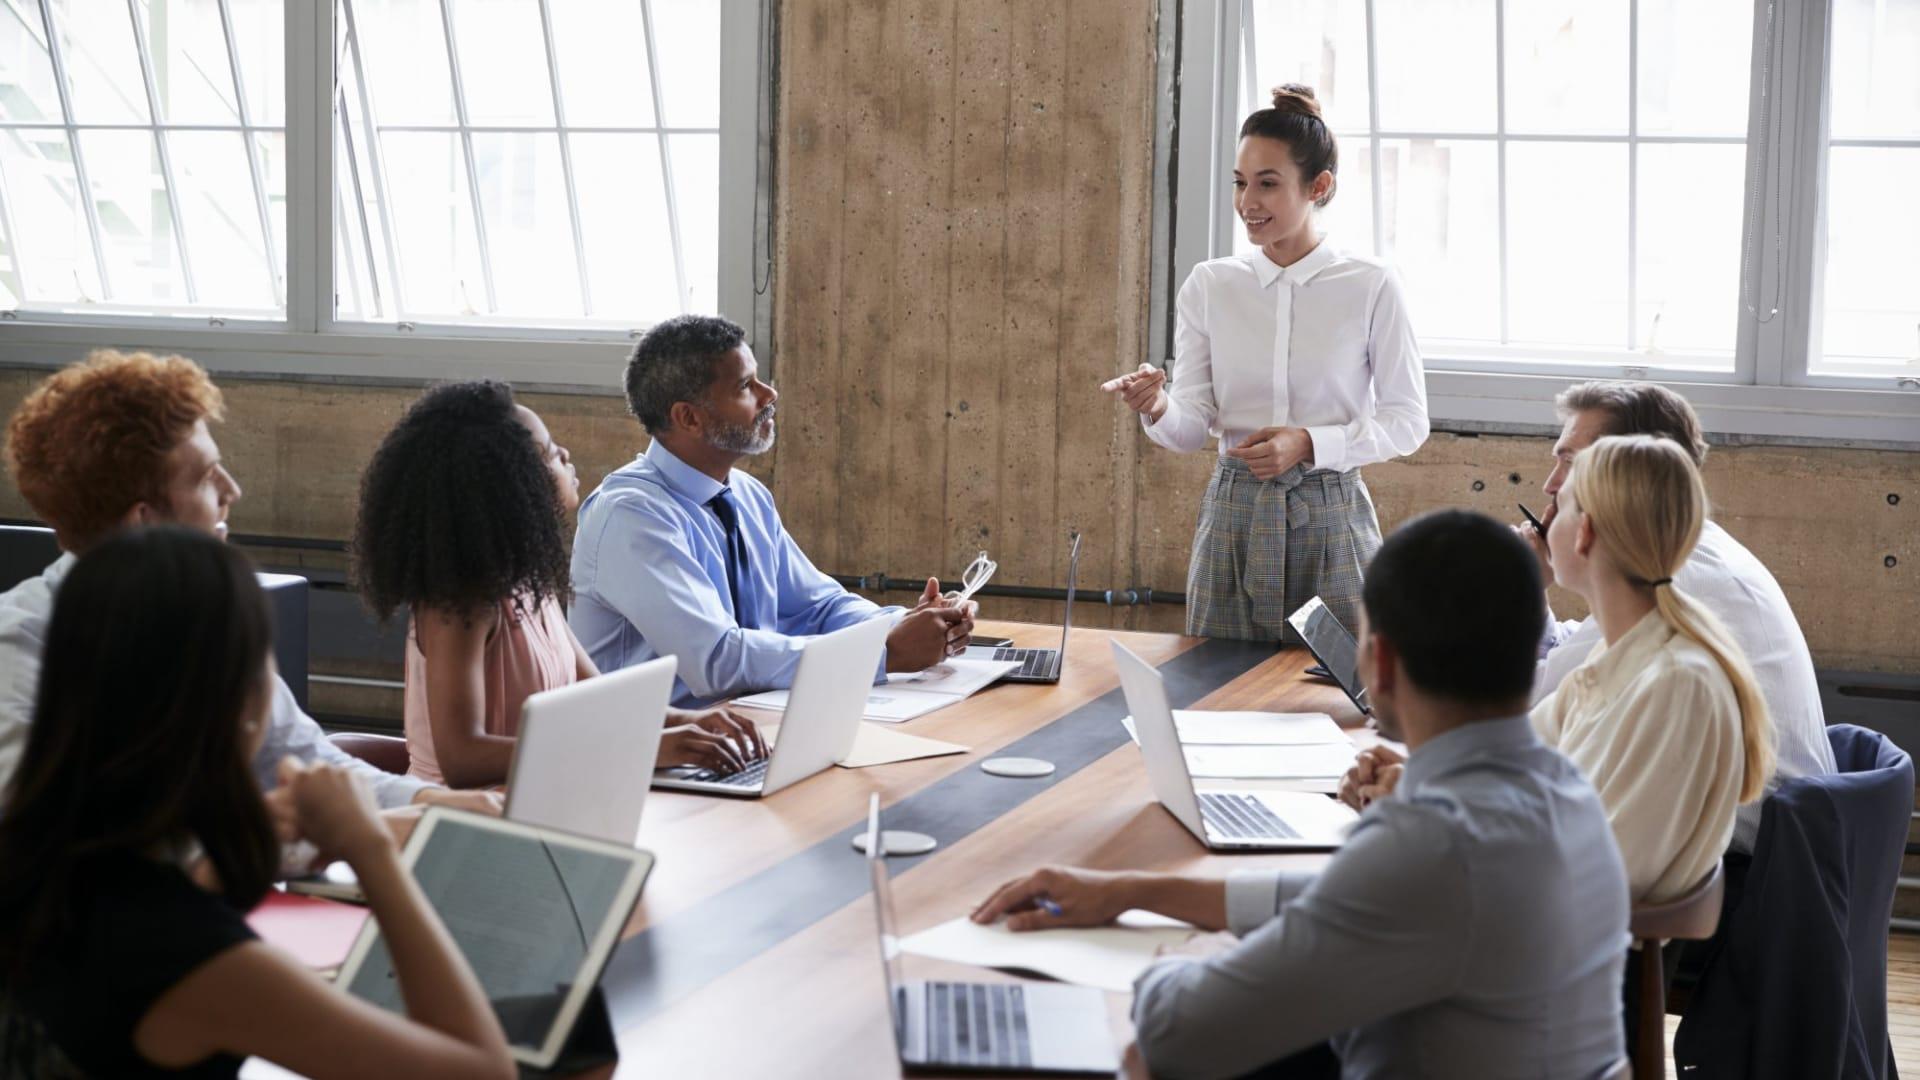 5 Key Takeaways Learned From Guiding Startups in Strategic Pivots